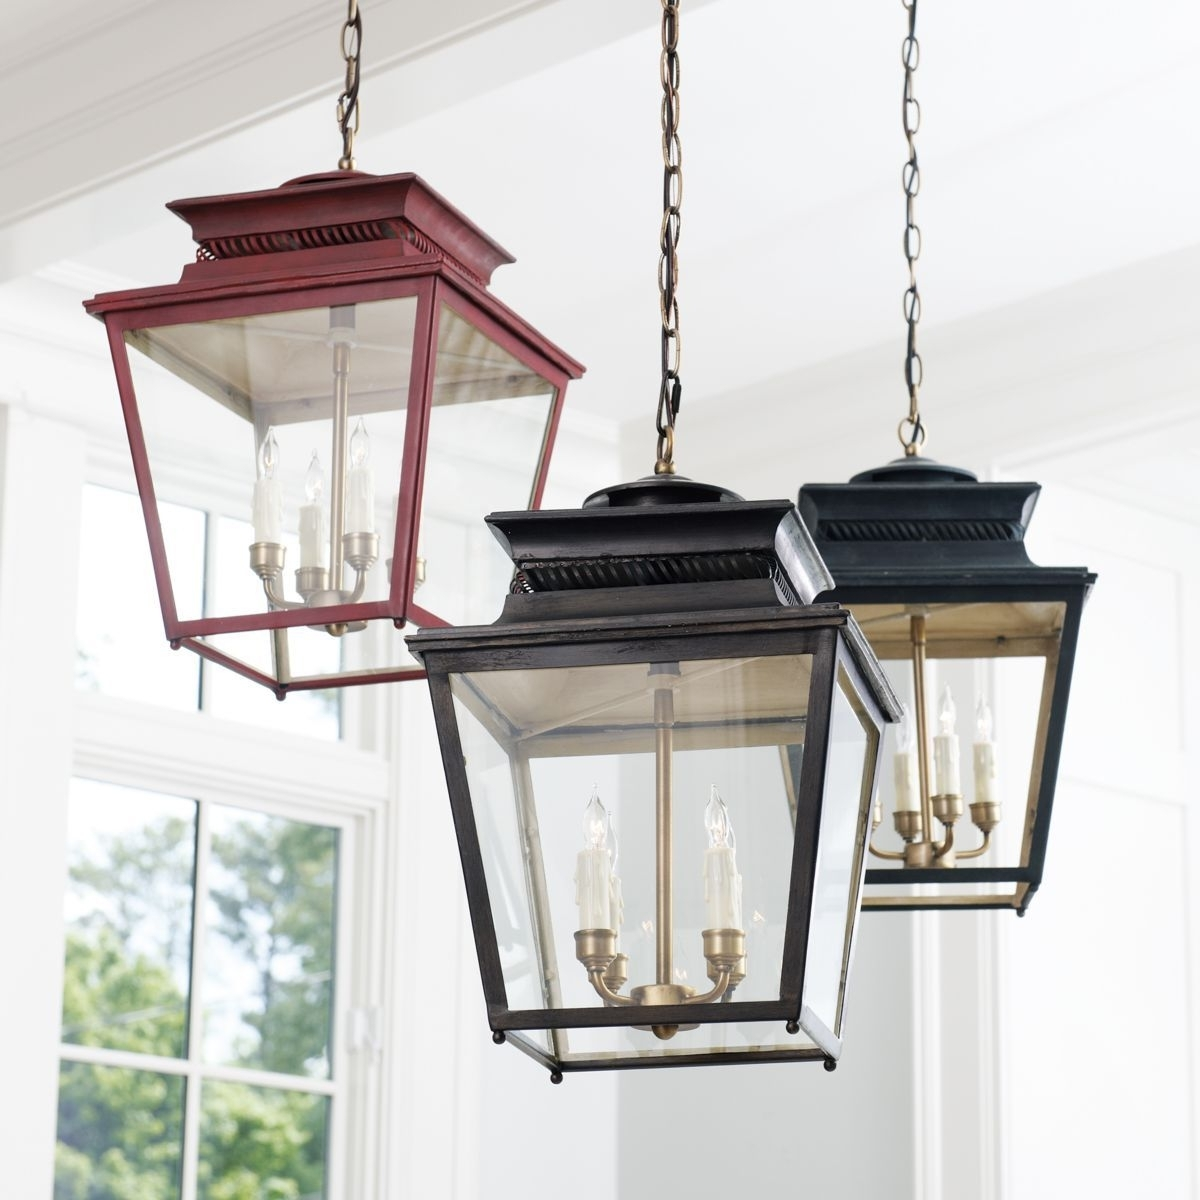 Piedmont 4 Light Lantern (View 15 of 20)